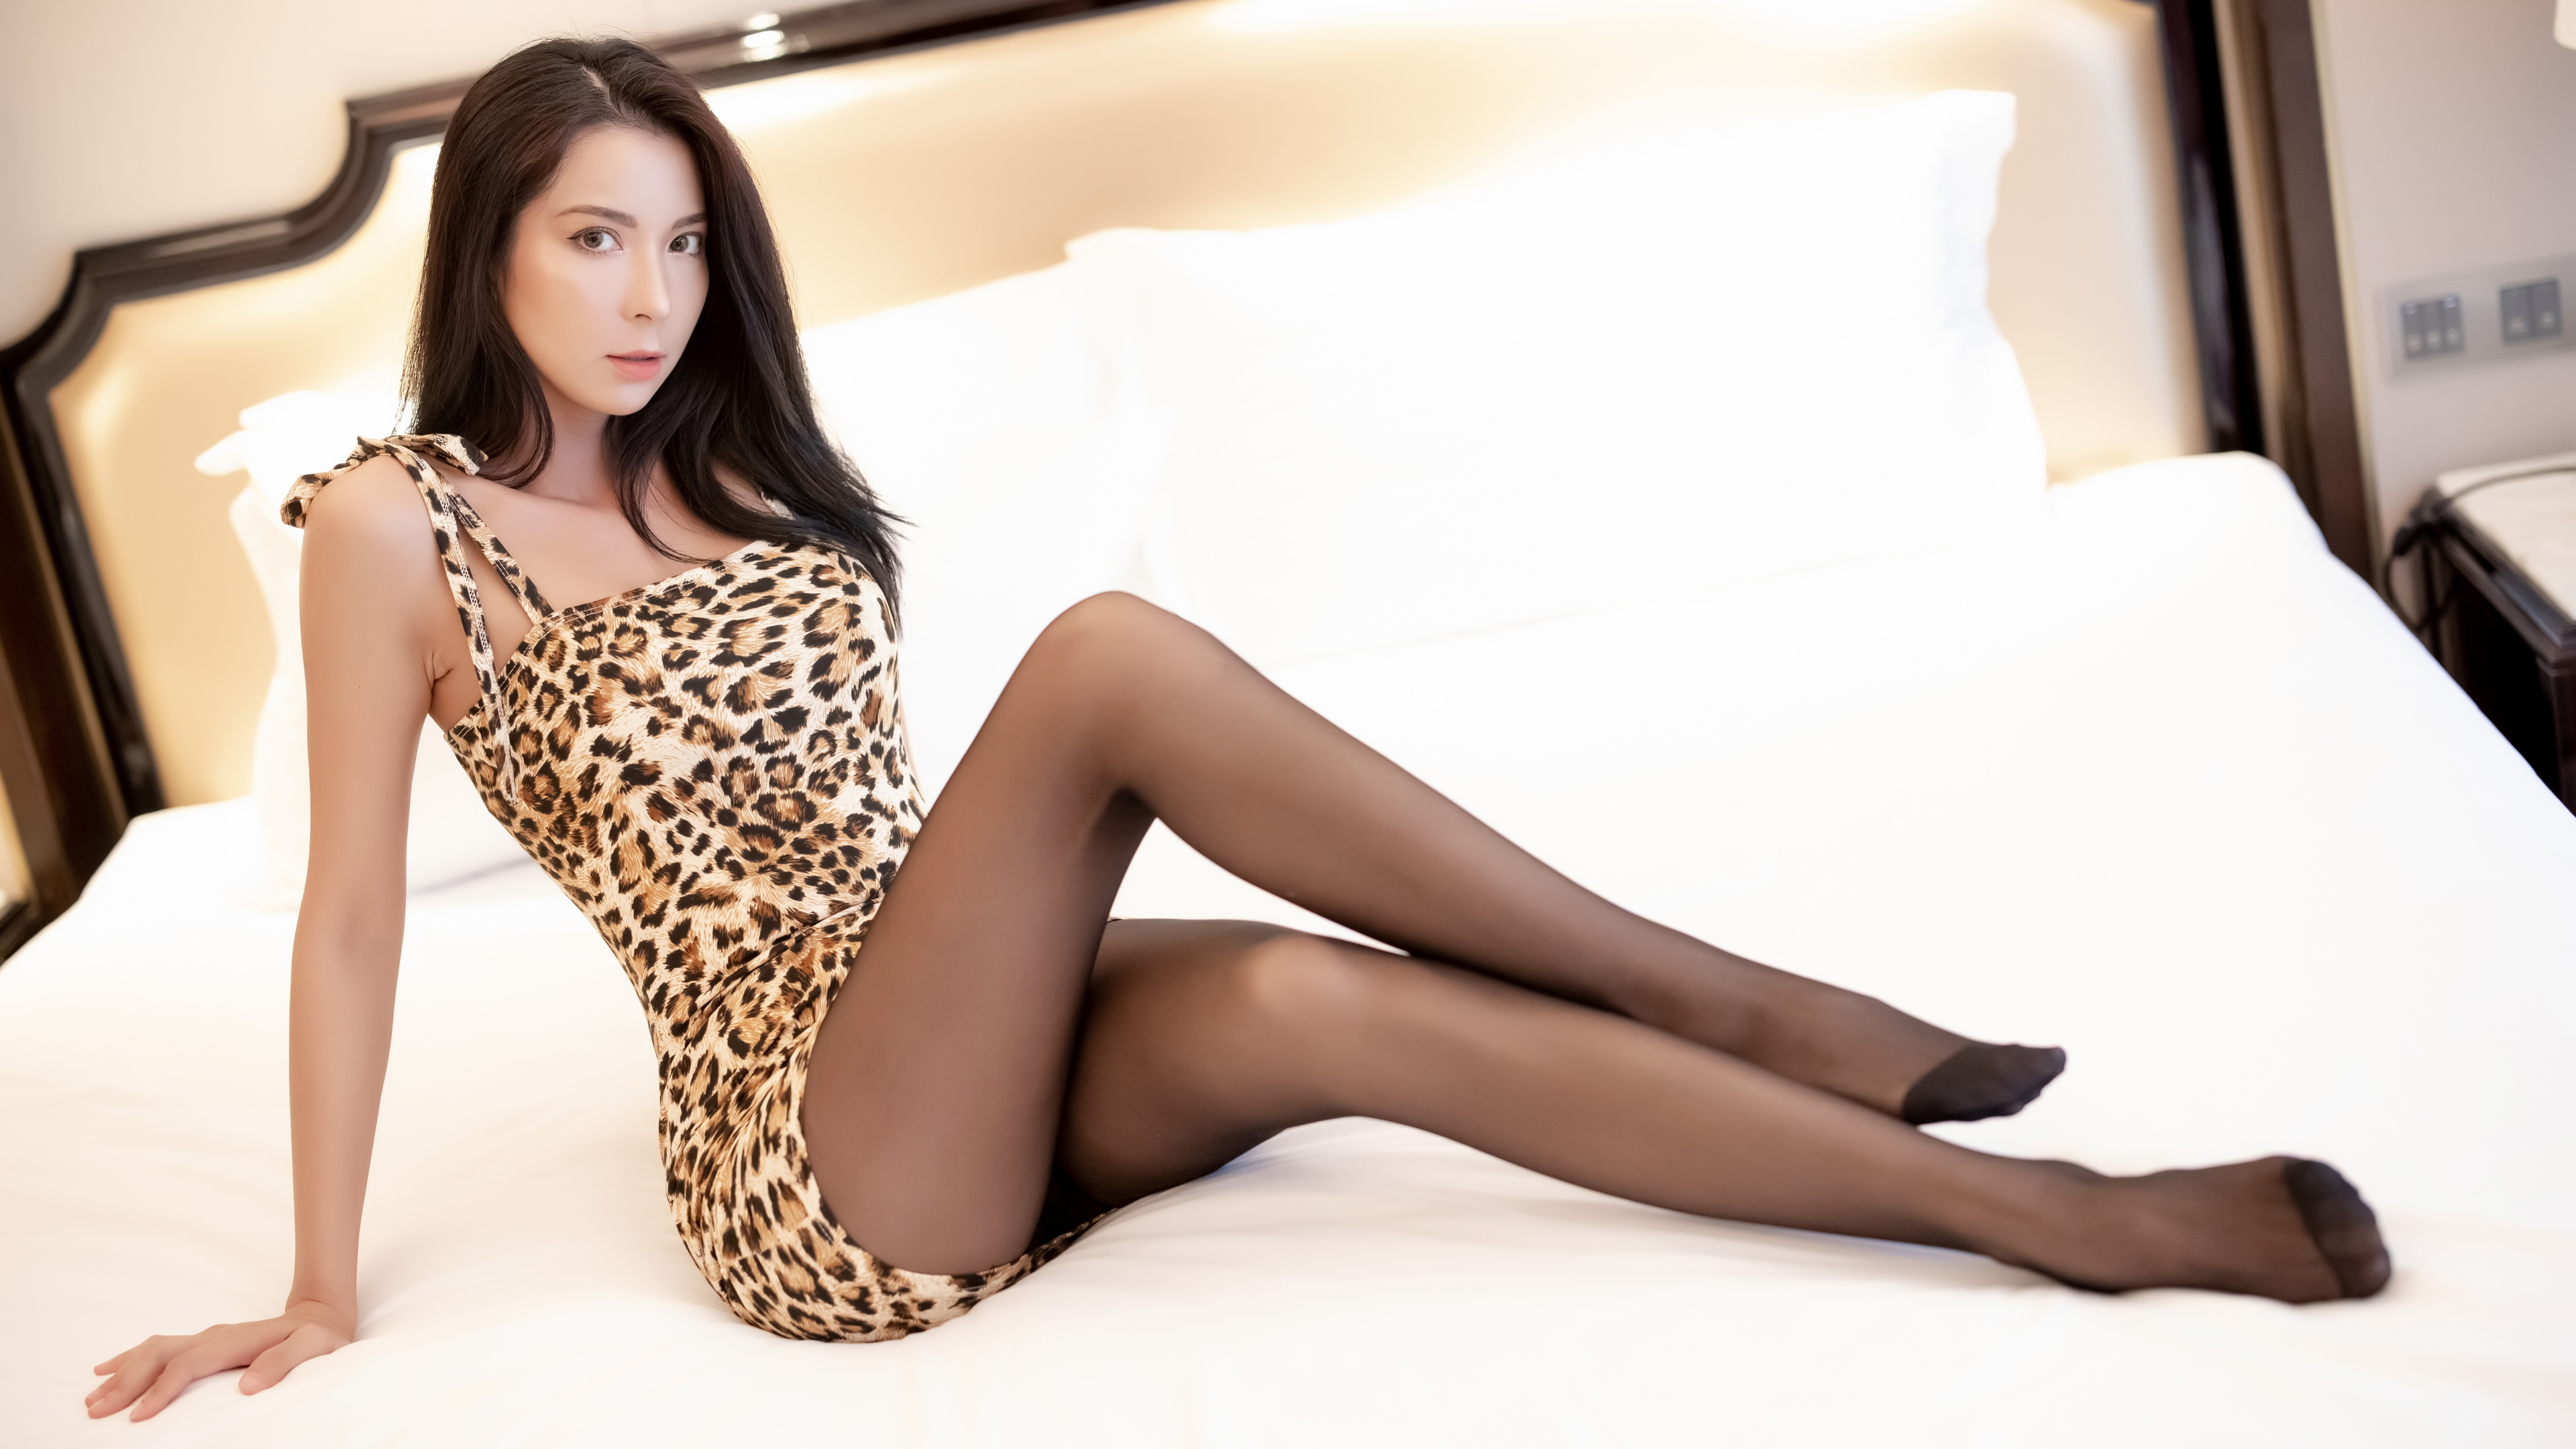 women, Asian, model, long hair, in bed, pantyhose